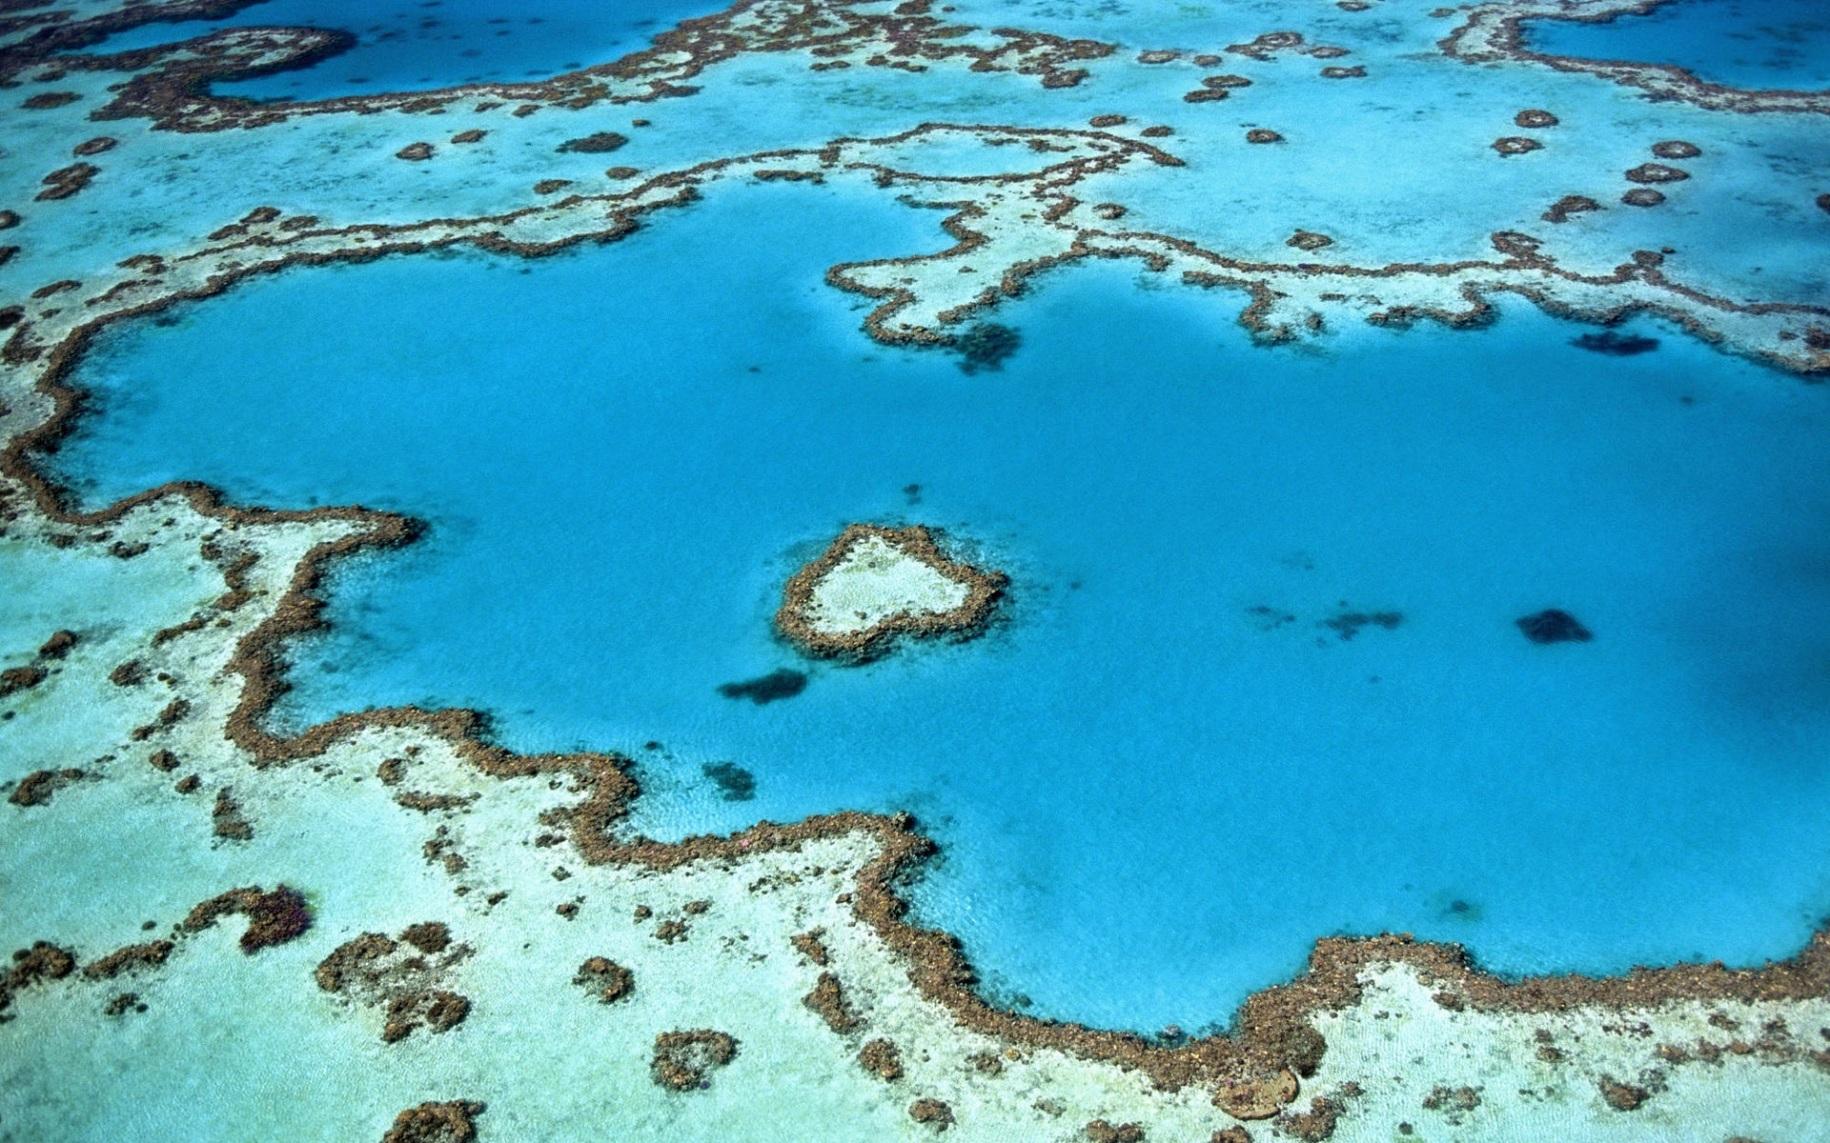 coral reef atolls cc0 unsplash